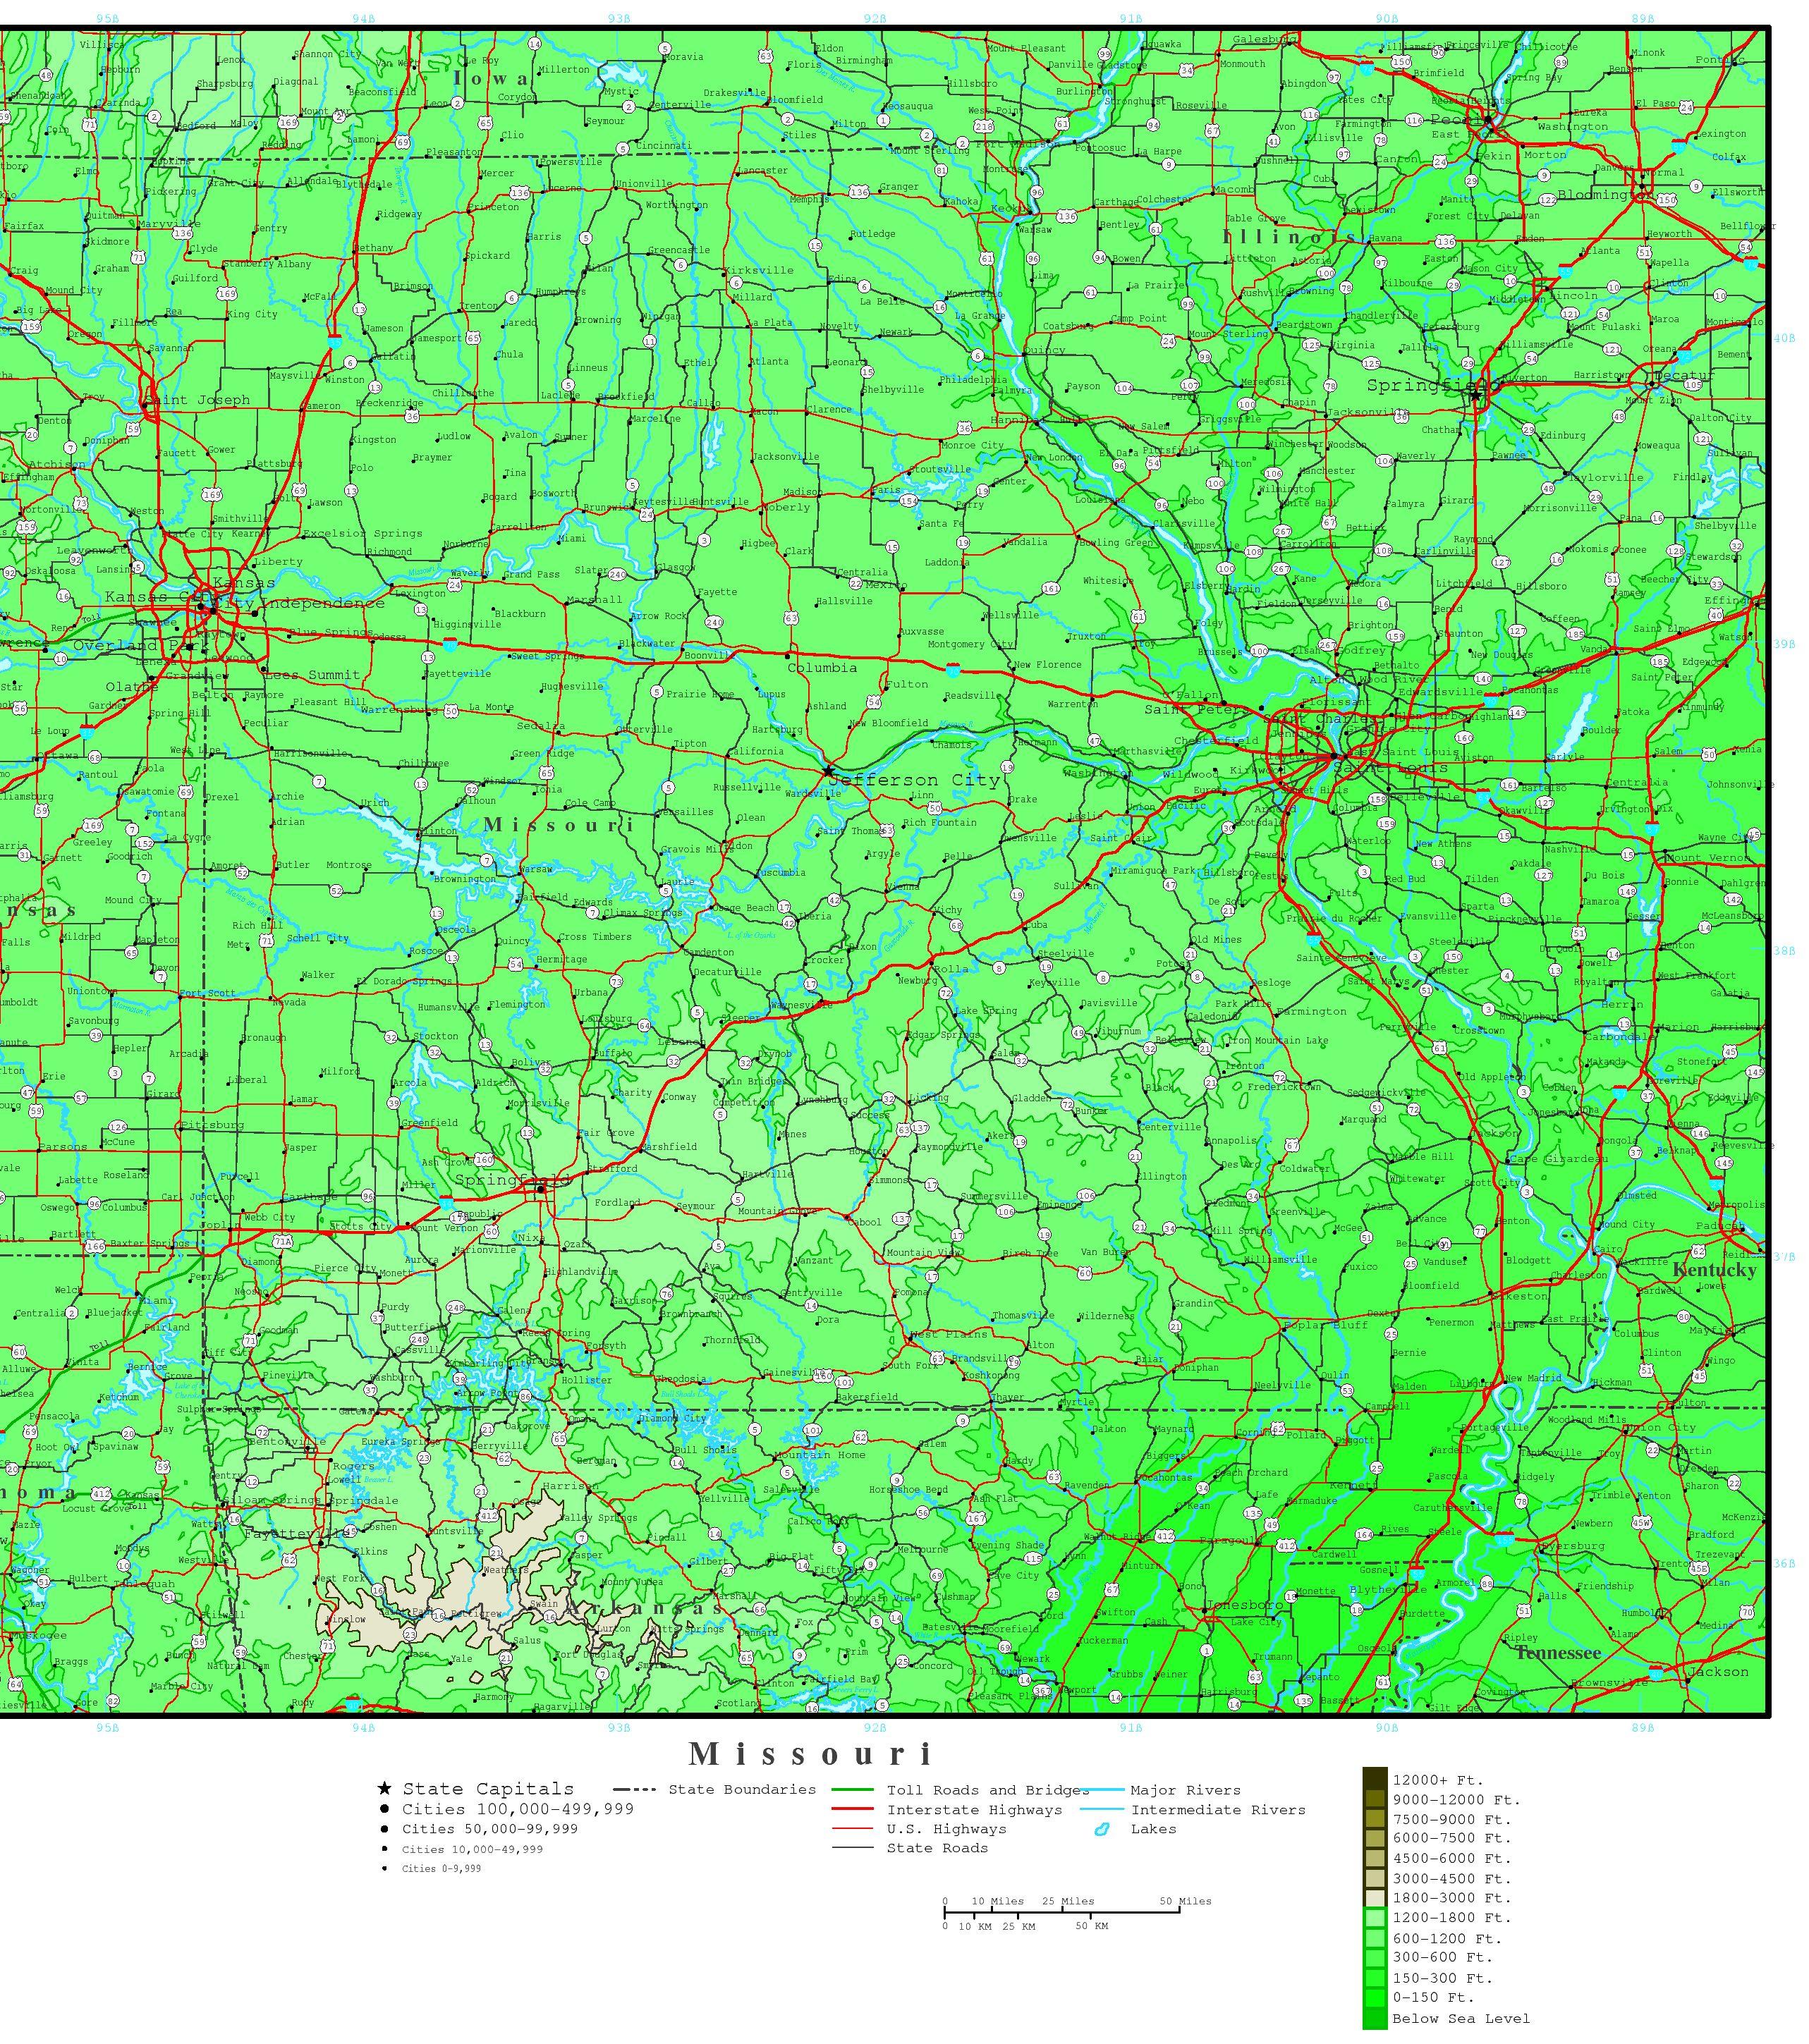 Missouri Elevation Map